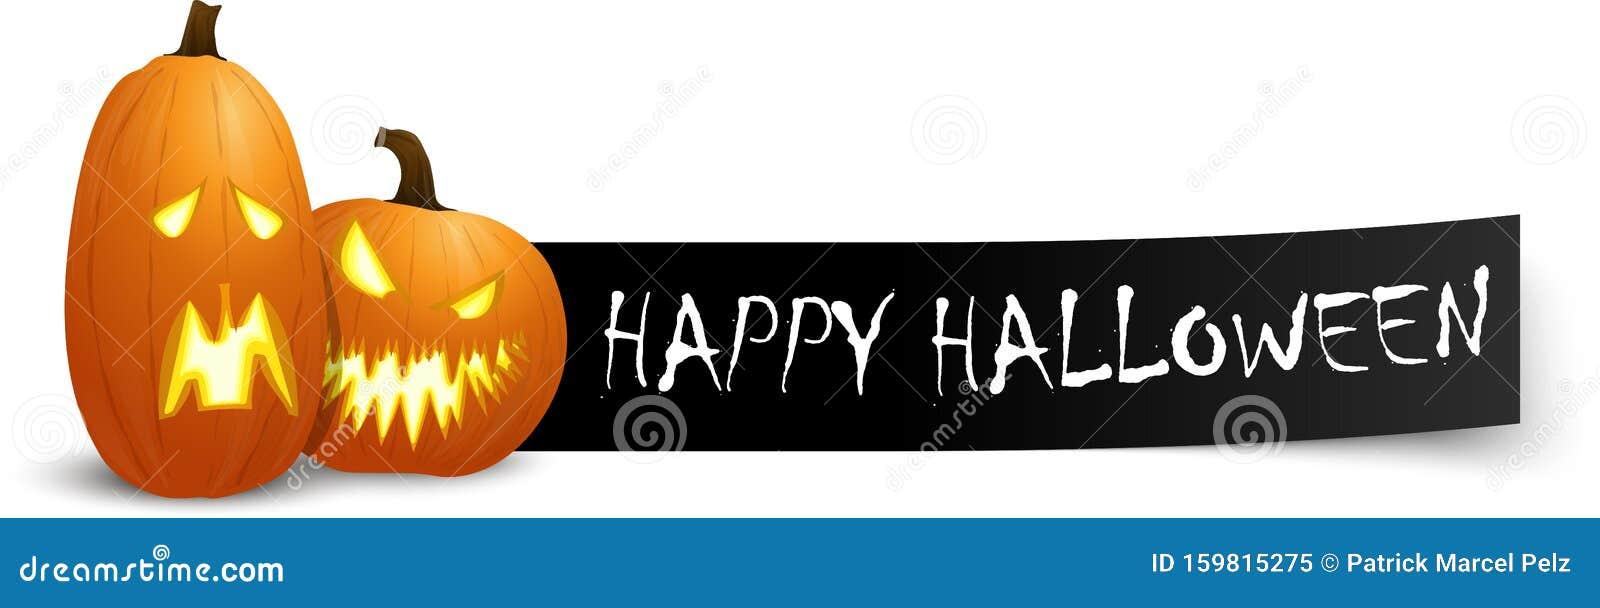 Happy Halloween Greetings With Pumpkins Stock Vector Illustration Of Darkness Halloween 159815275